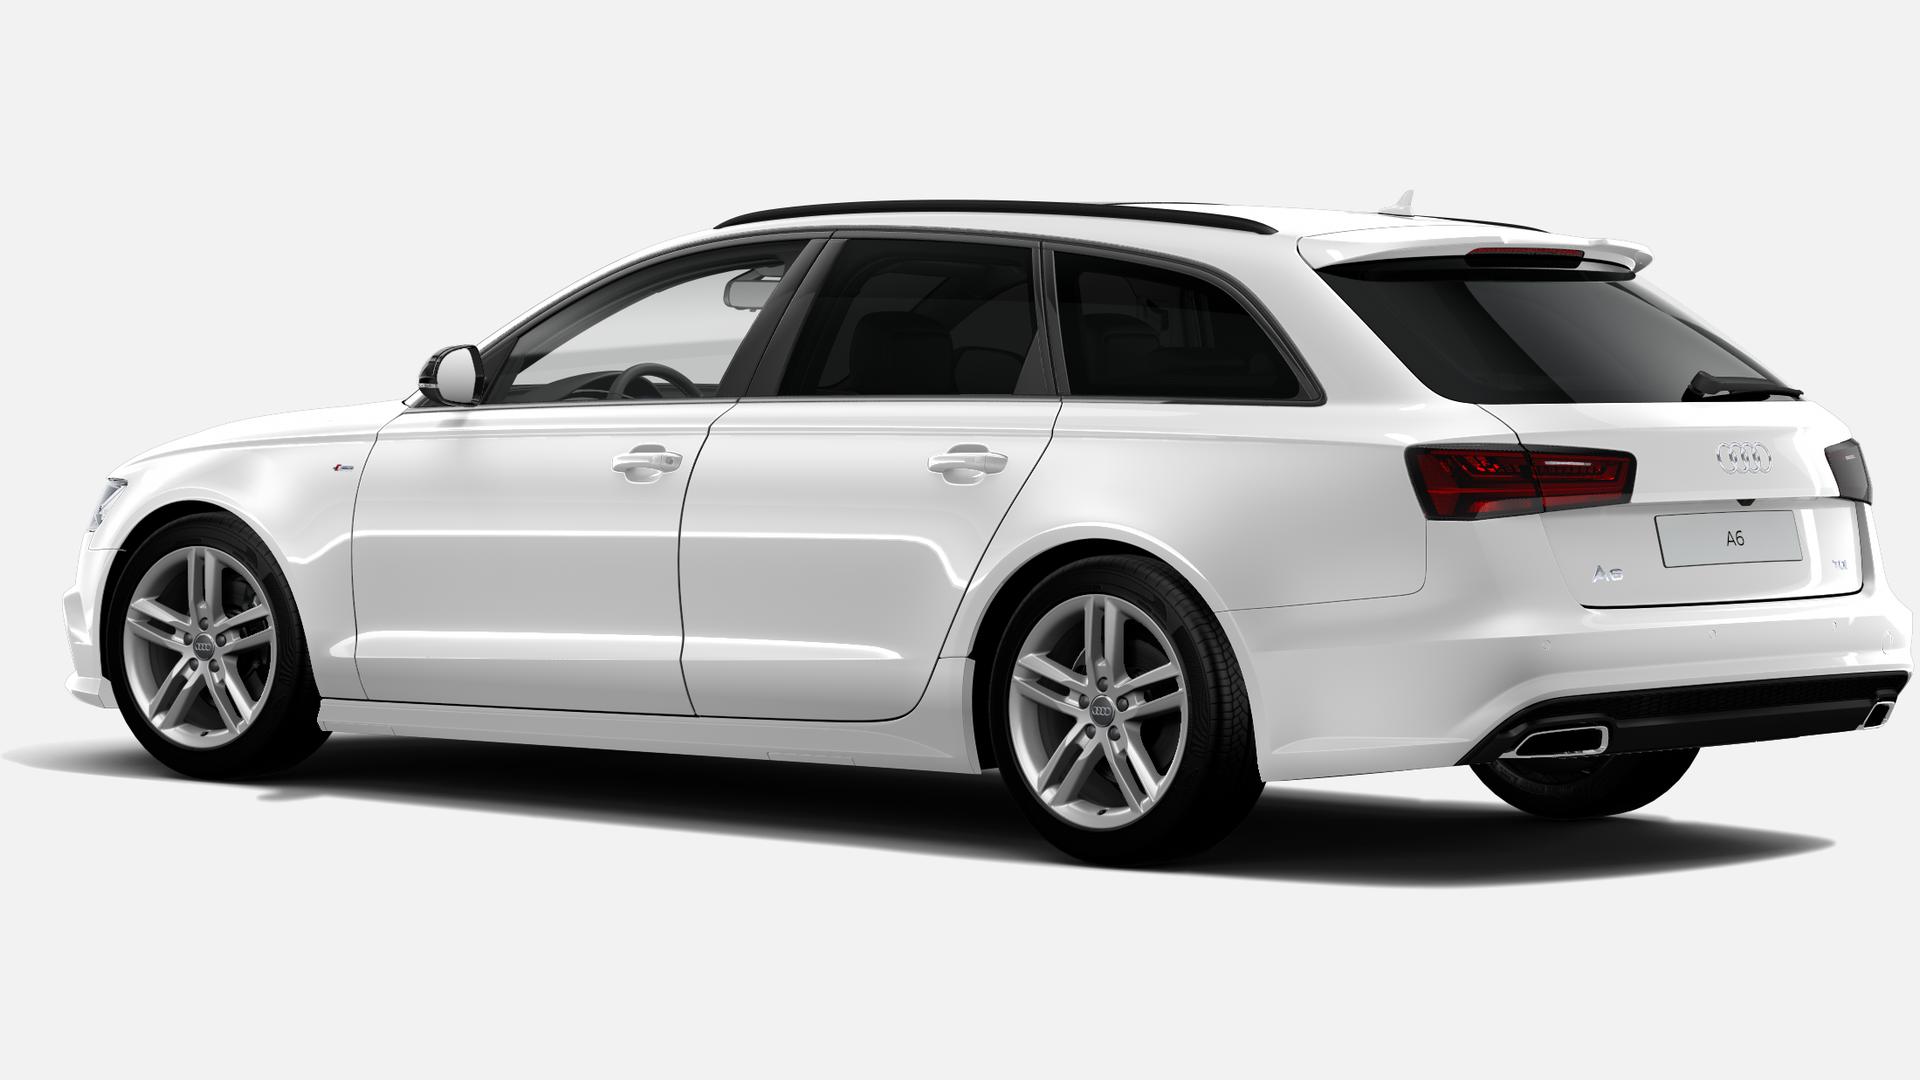 Vista Tres cuartos trasera izquierda de Audi A6 Avant 2.0 TDI Black line ultra S Tronic 140 kW (190 CV)